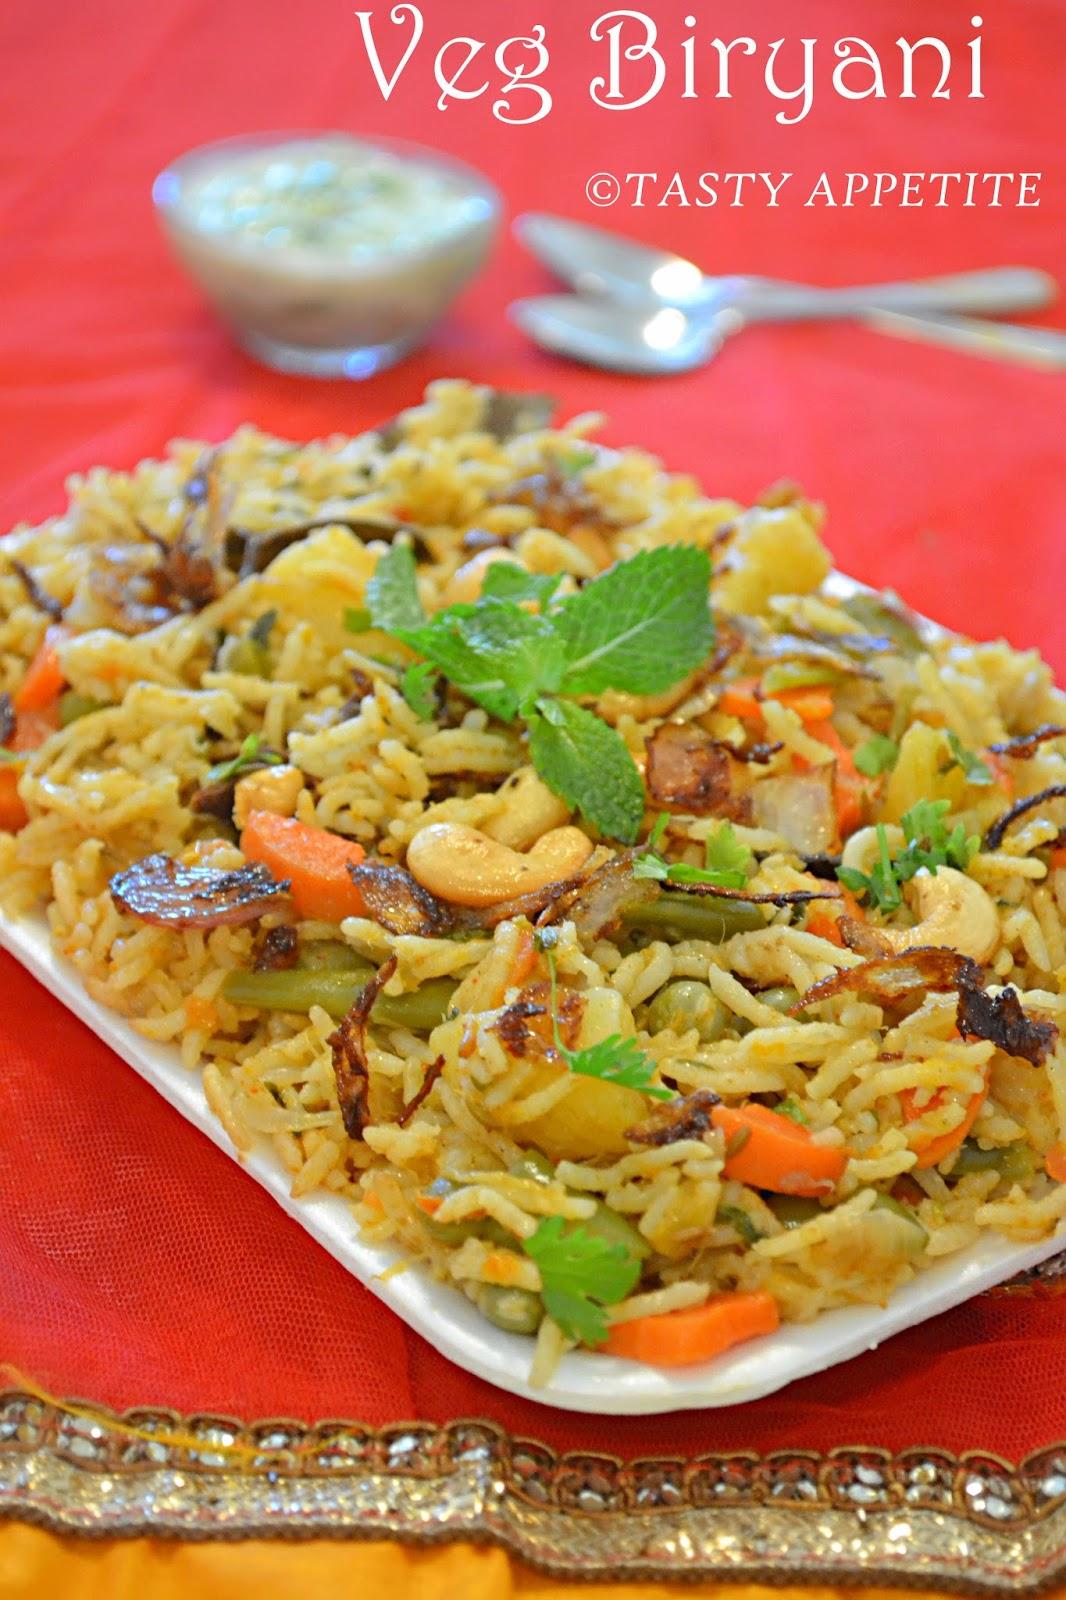 Vegetable Biryani Spicy Vegetable Biryani Recipe Easy Biryani Recipes